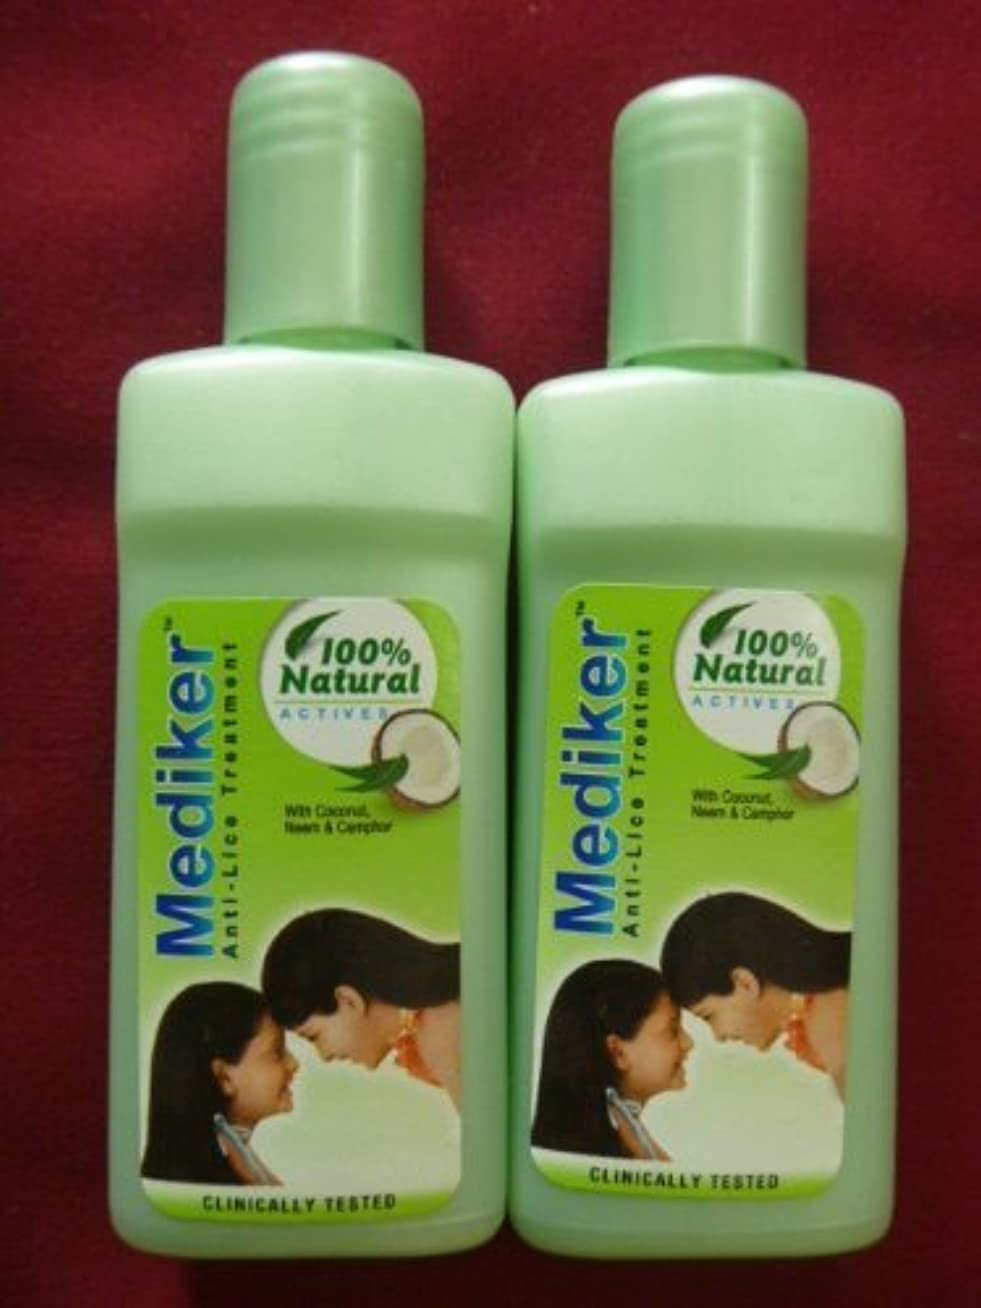 無限放射性継続中2 X Mediker Anti Lice Remover Treatment Head Shampoo 100% Lice Remove 50ml X 2 = 100ml by Mediker [並行輸入品]